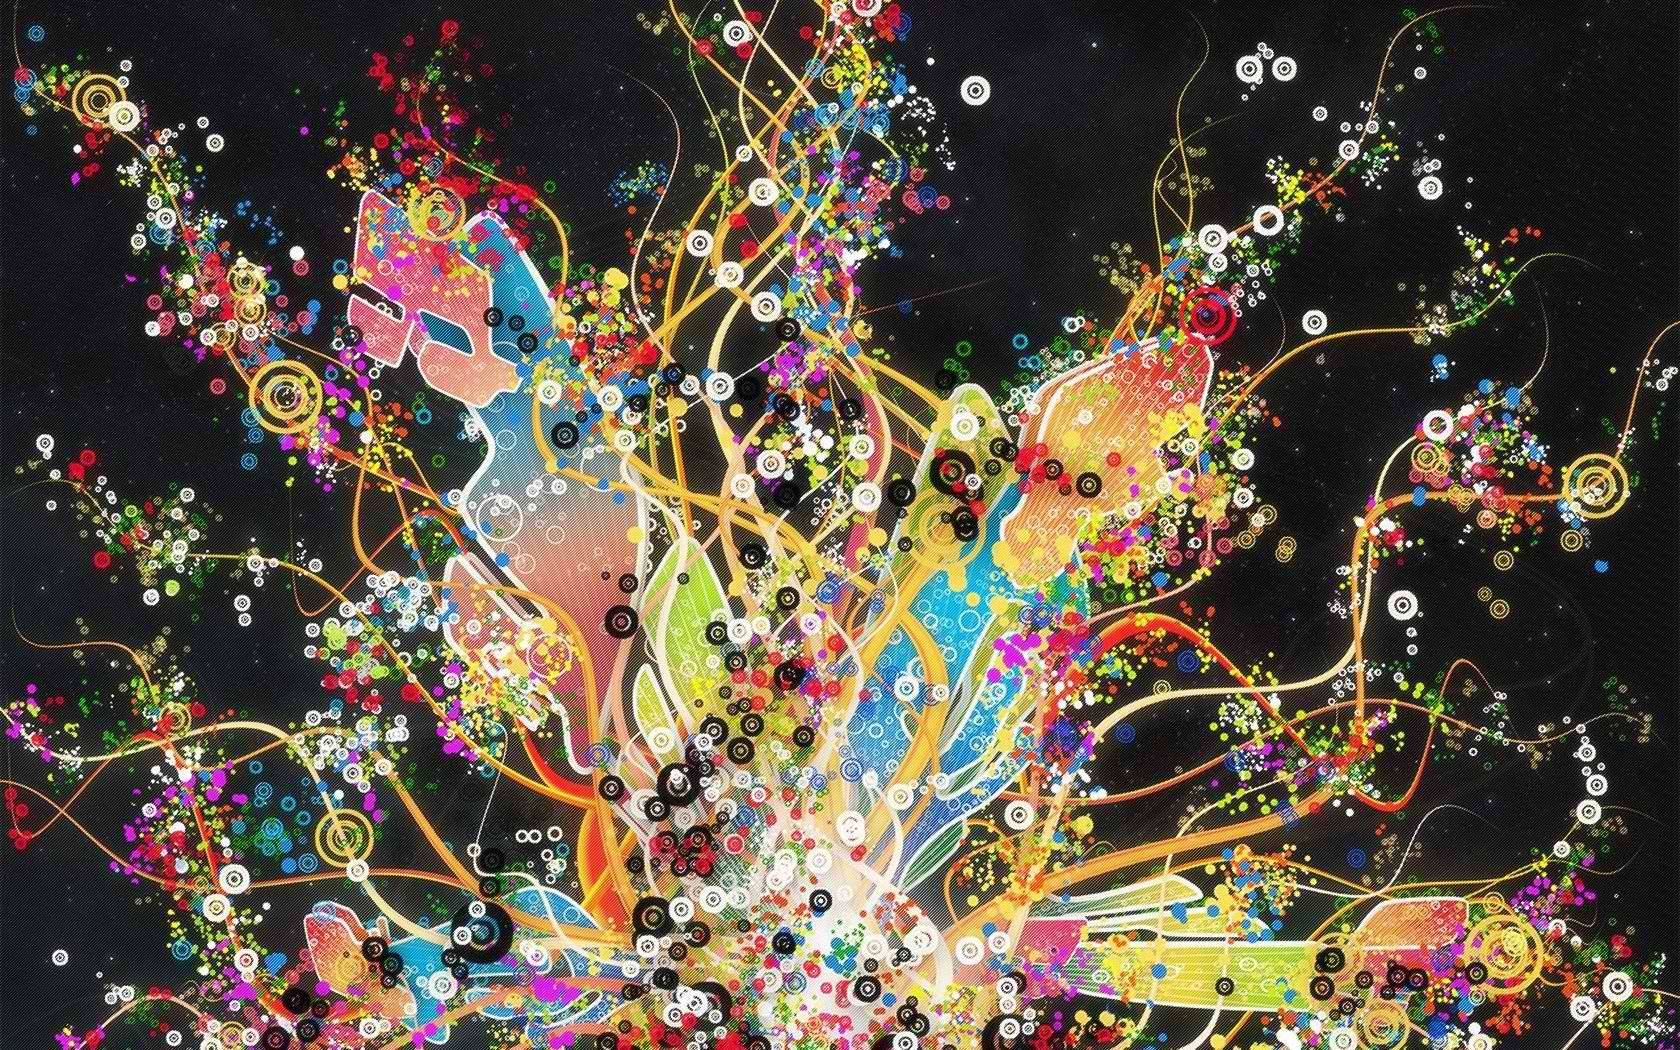 Top Wallpaper High Quality Trippy - ec9d534b7ecd9d66fbdbc8f12db536b8  Pic_754815.jpg